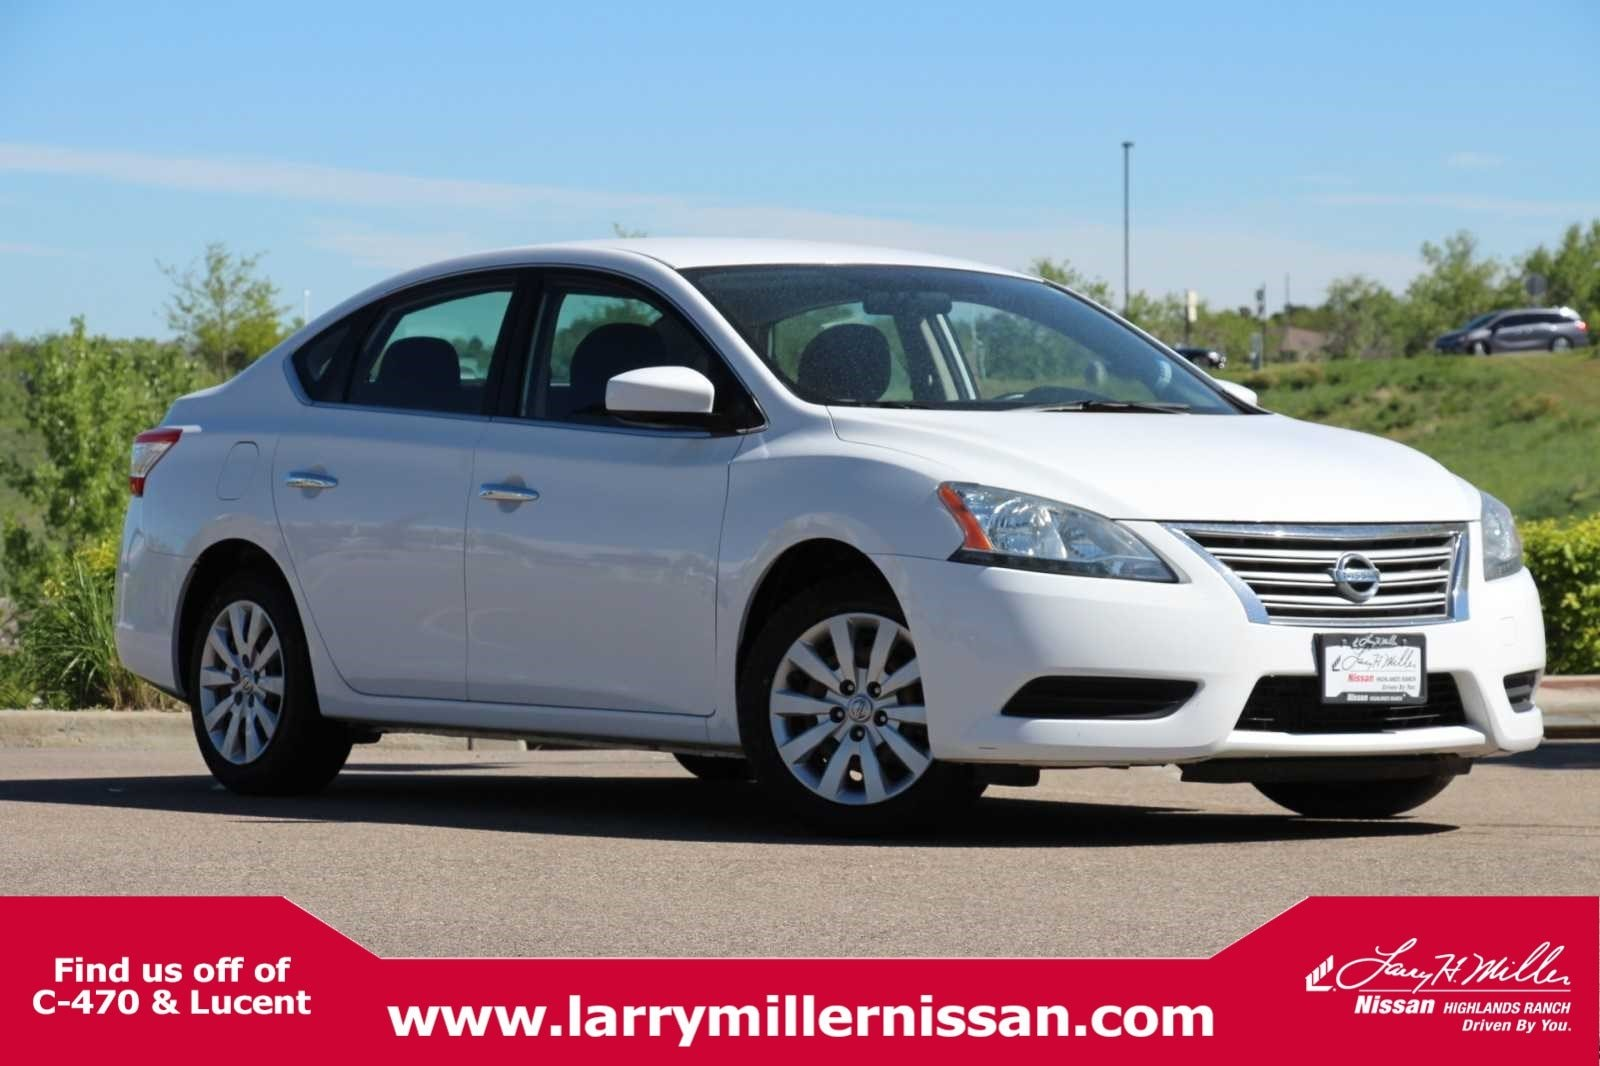 Featured Pre-Owned 2015 Nissan Sentra S Sedan 3N1AB7AP8FL655721 for sale near Denver, CO